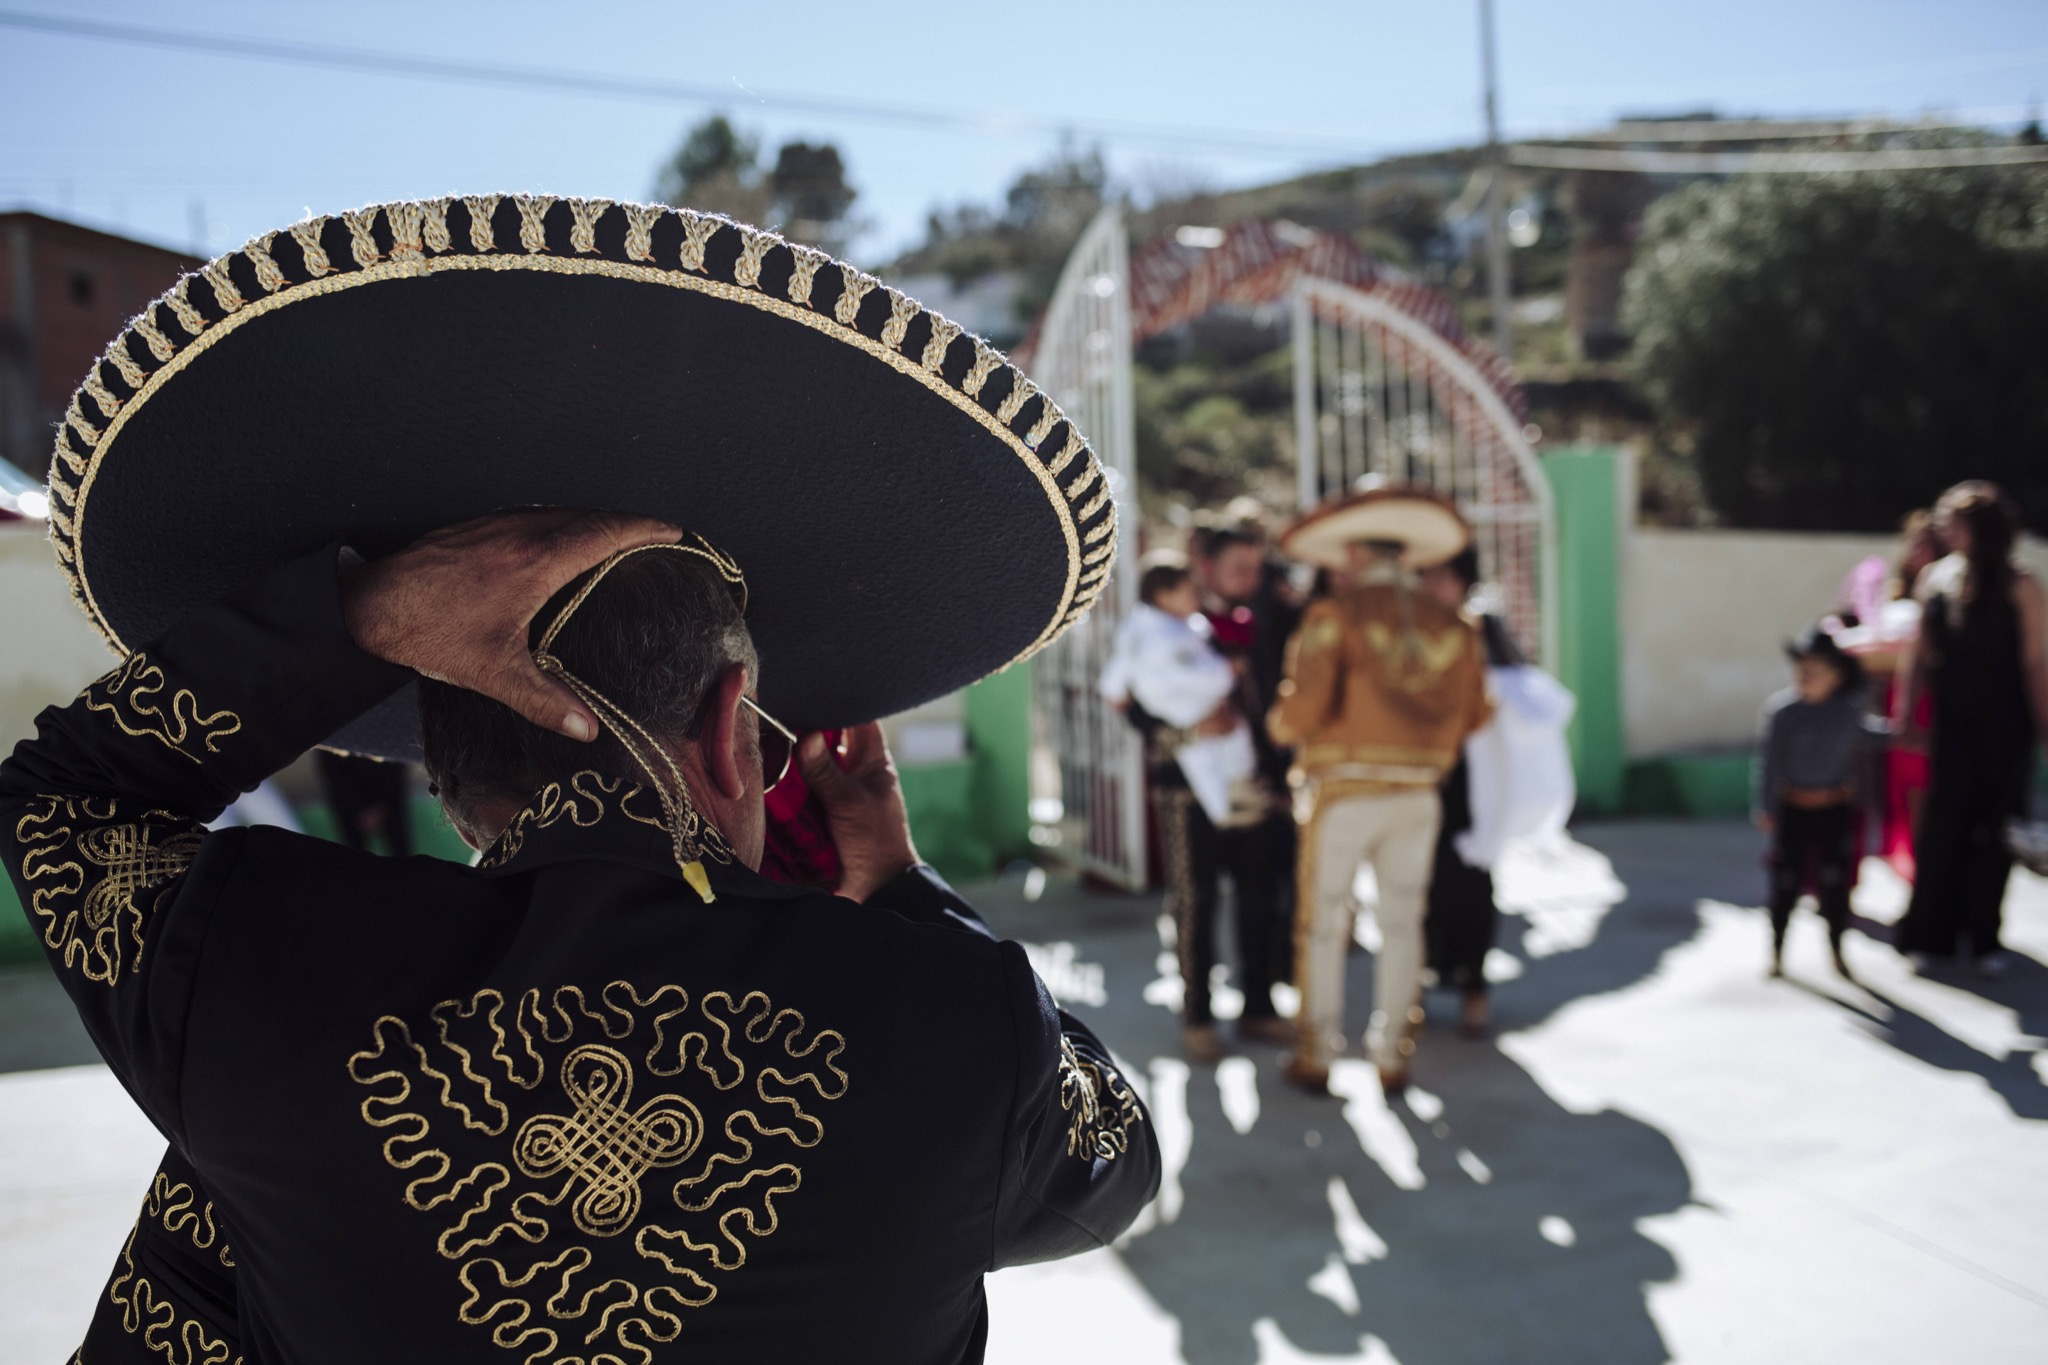 javier_noriega_fotografo_profesional_bodas_zacatecas_mexico_chihuahua_photographer_12